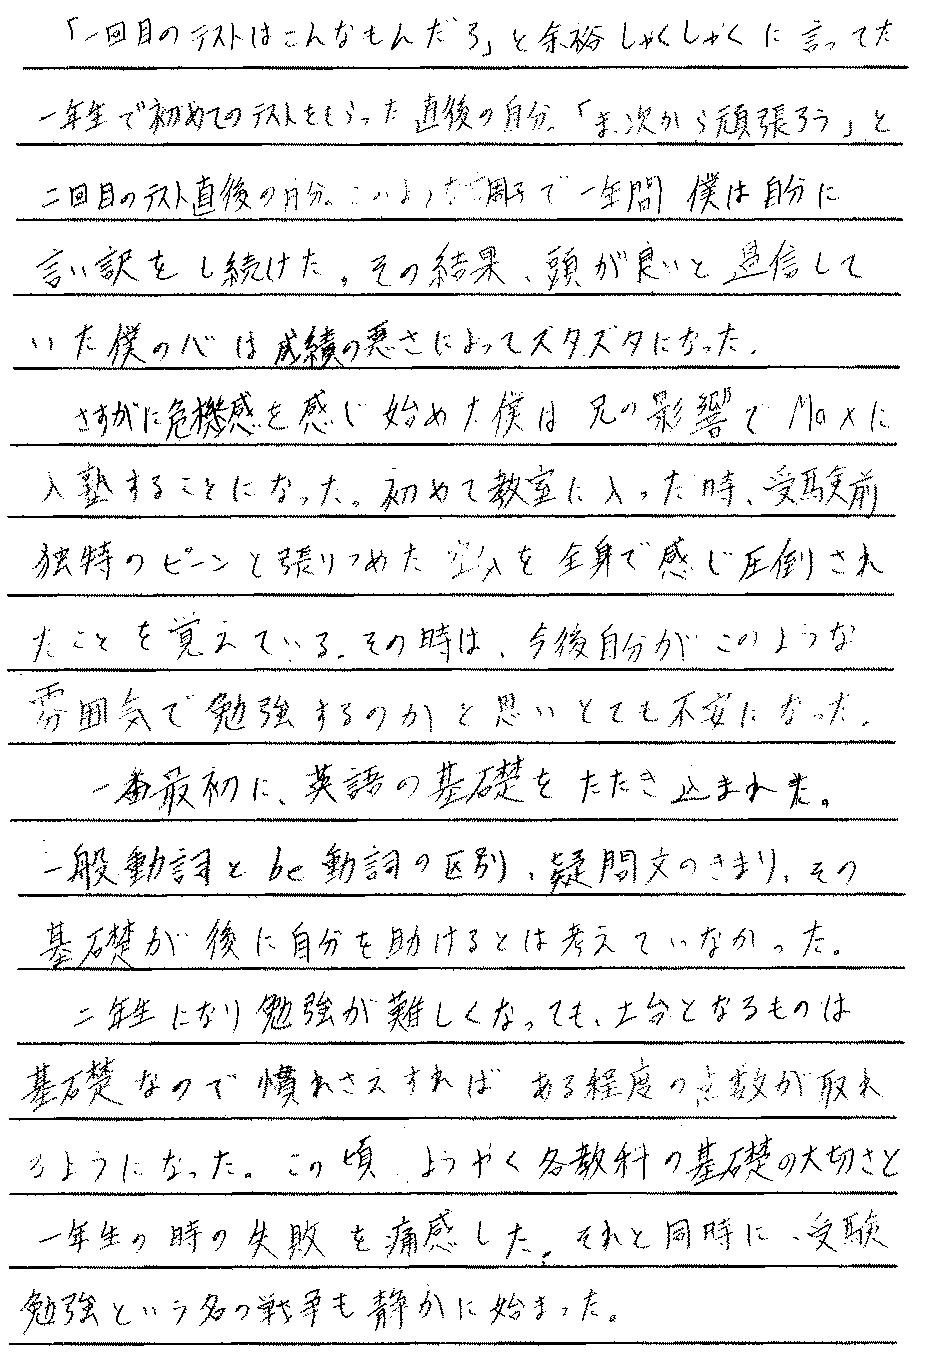 341-1